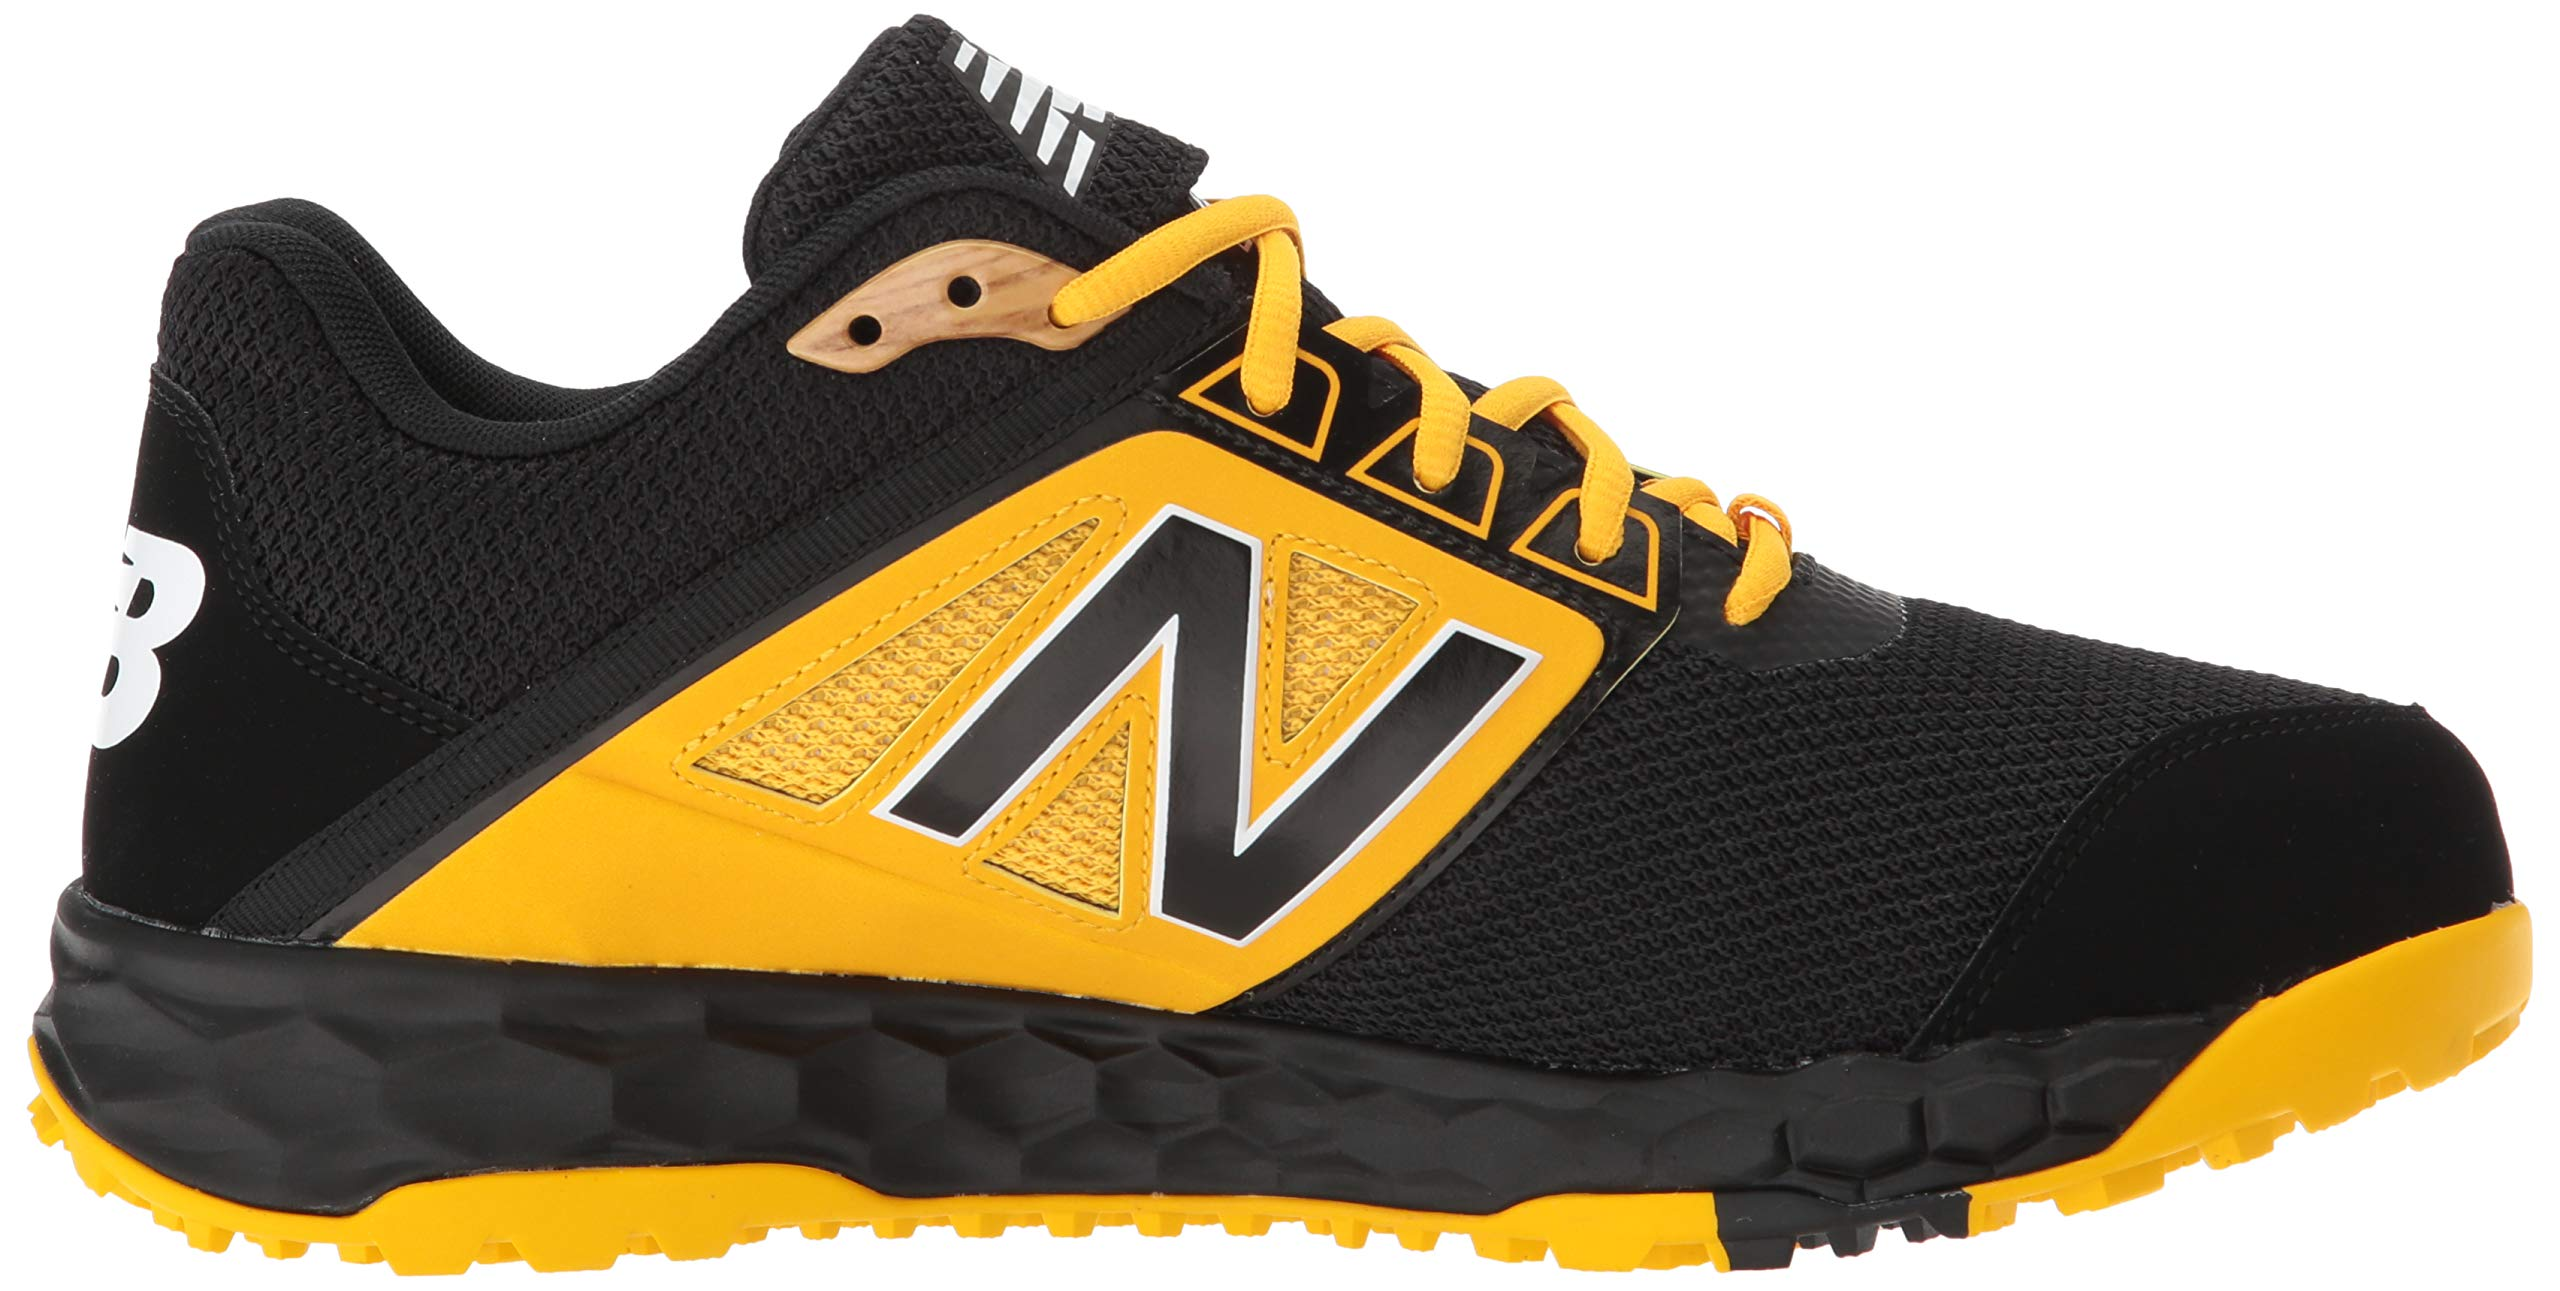 New Balance Men's 3000v4 Turf Baseball Shoe, Black/Yellow, 5 D US by New Balance (Image #7)